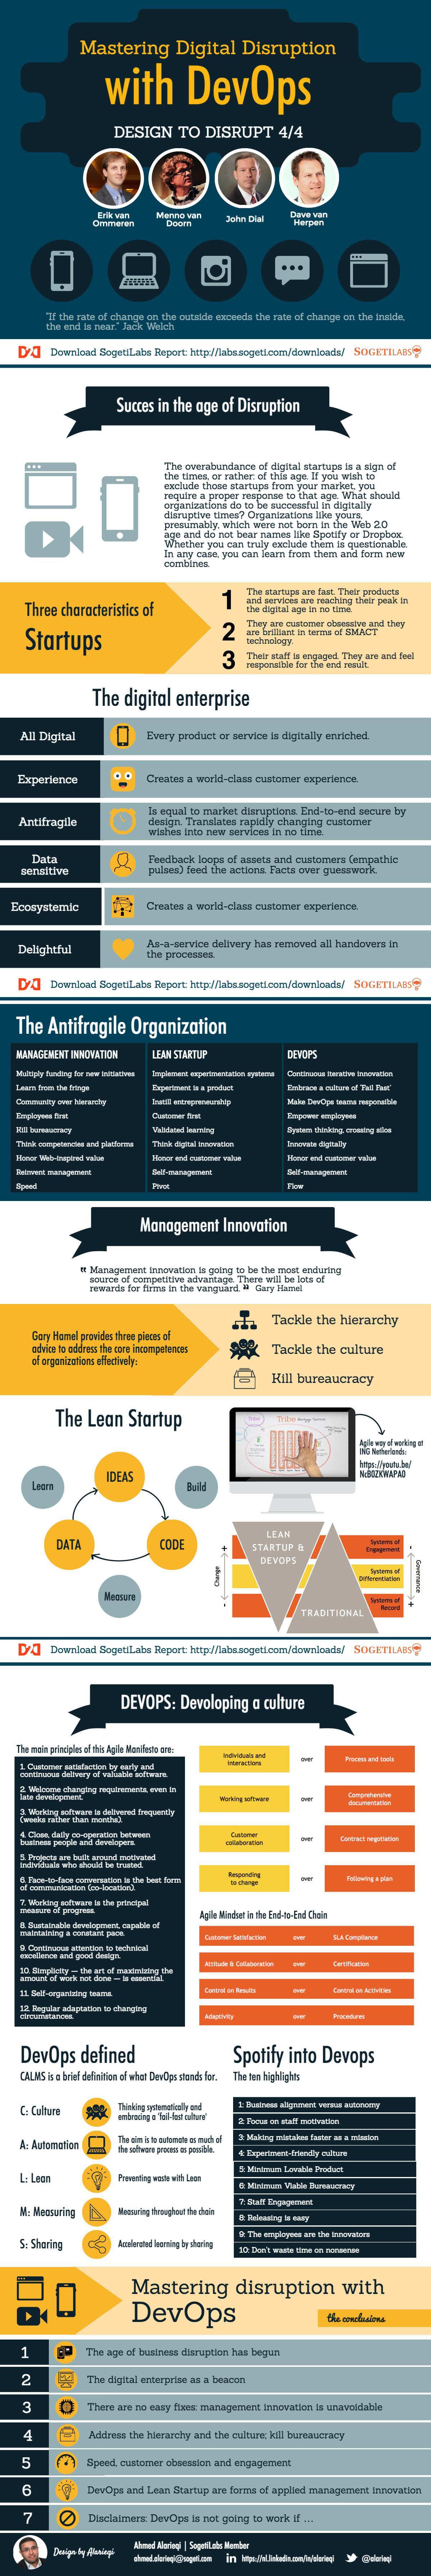 Infographic – Mastering Digital Disruption with DevOps